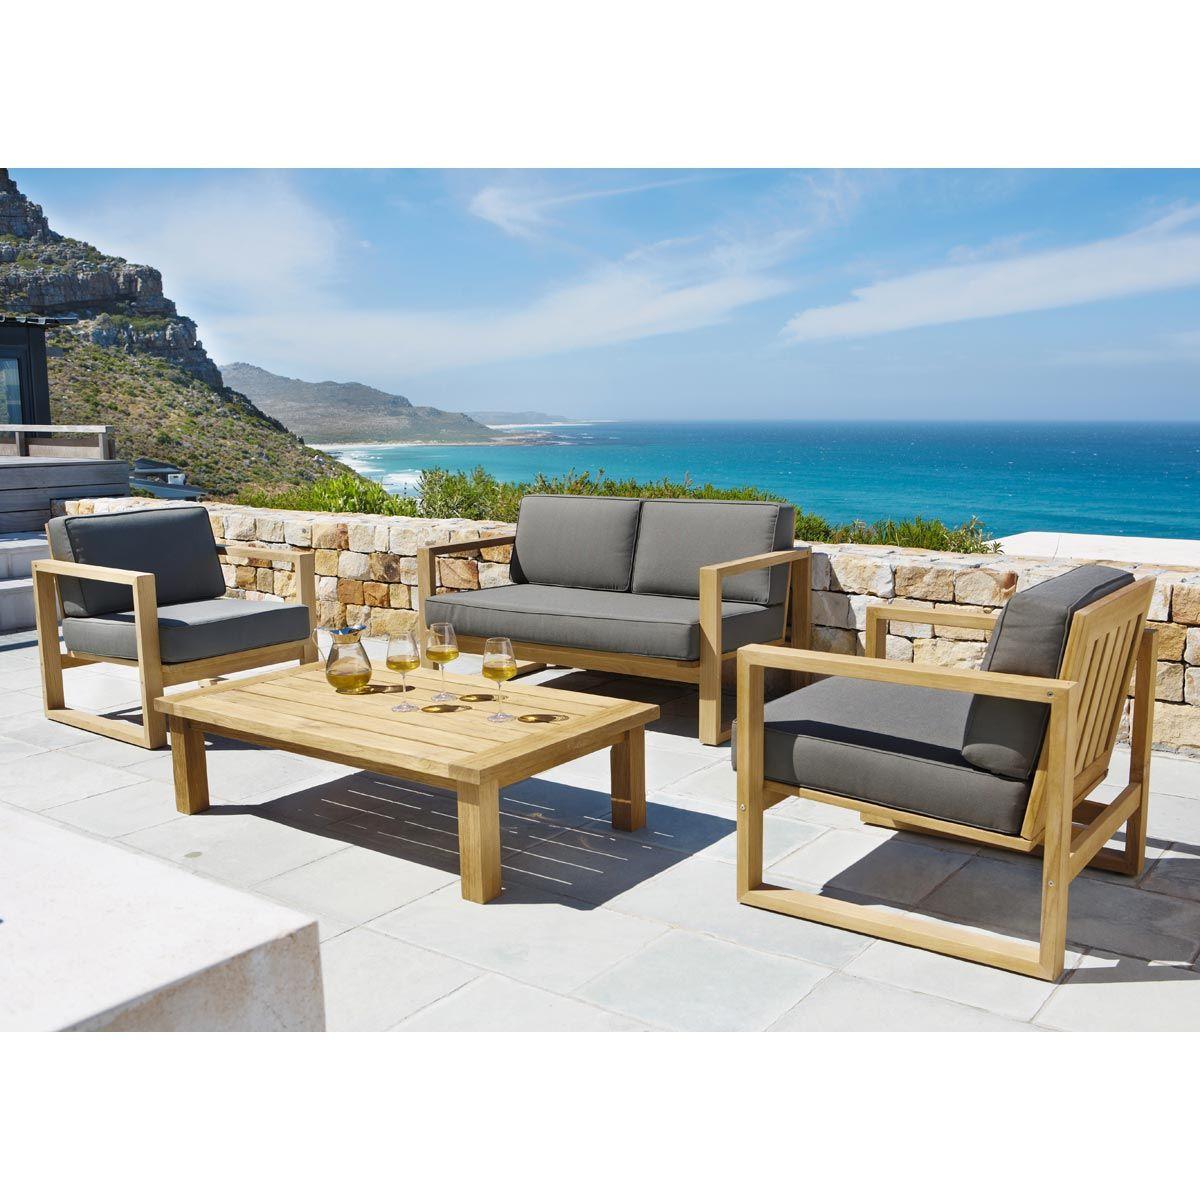 Mobilier de jardin terrasse mobili da giardino for Mobili terrazza